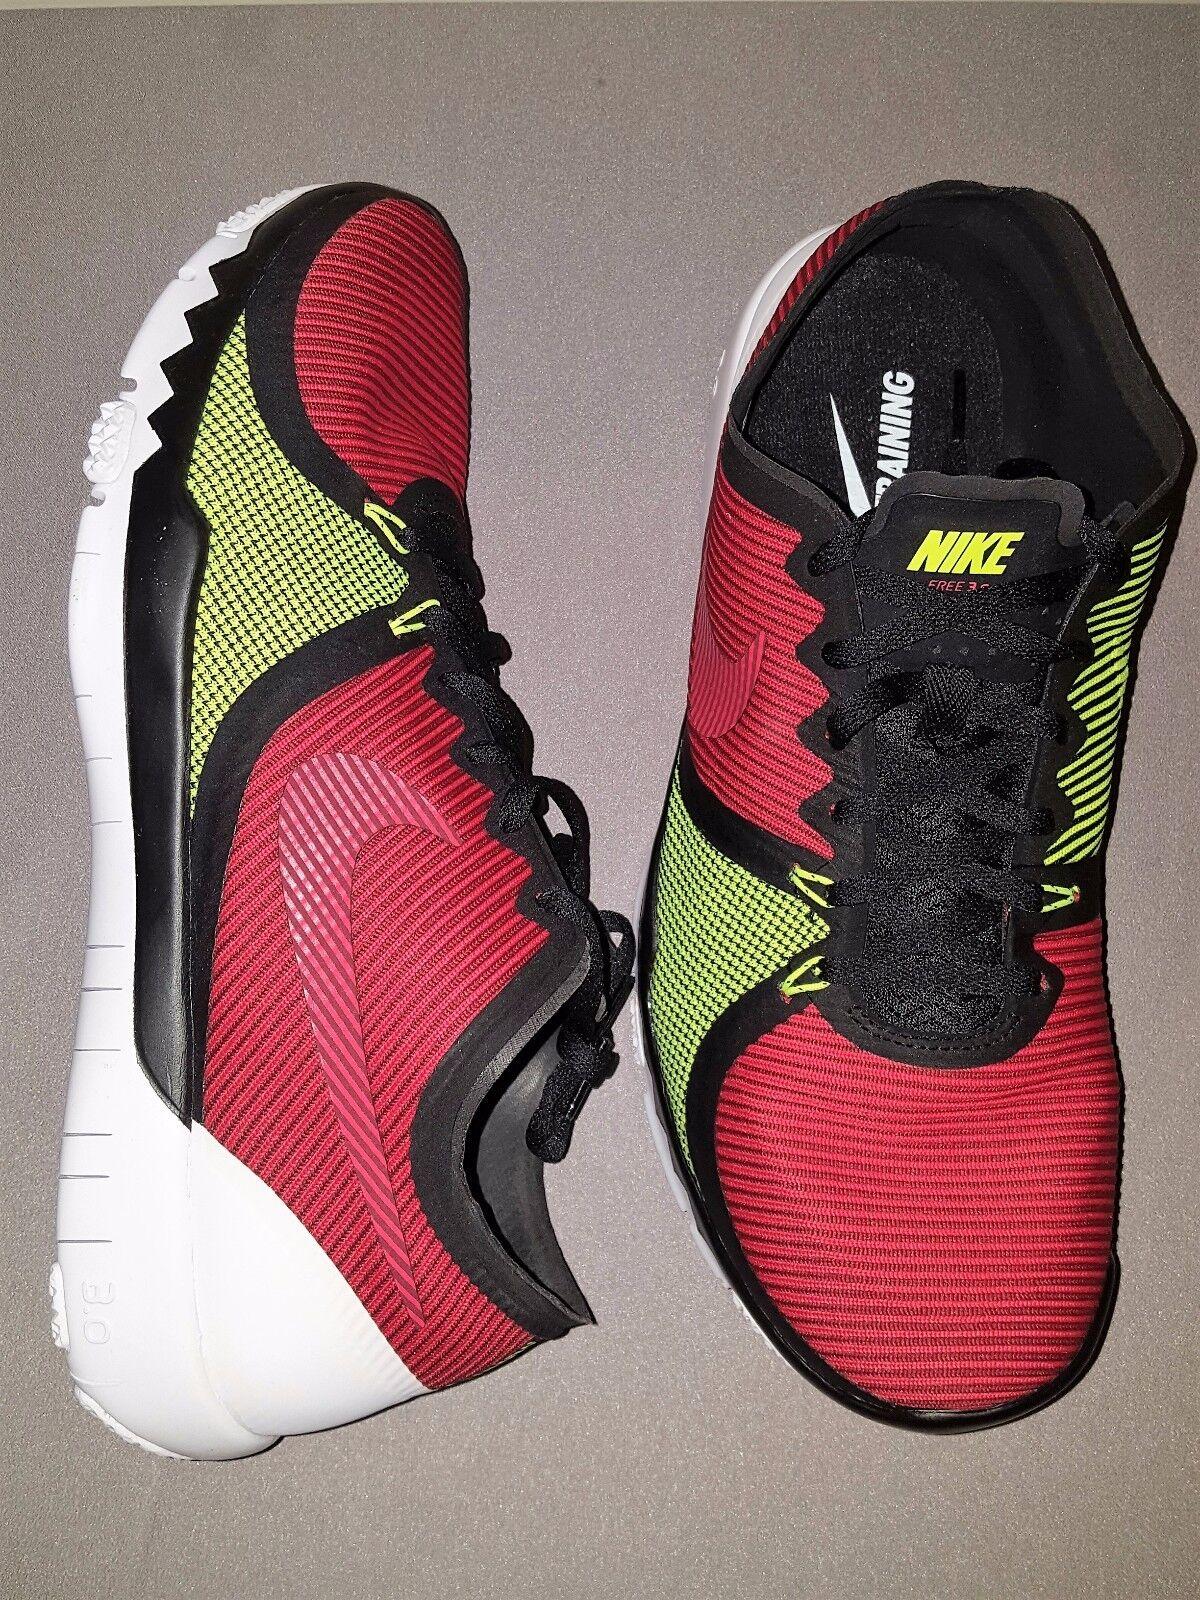 Nike V4 Free Trainer 3.0 V4 Nike Negro Rojo Zapatos  para Hombre US tamaño 11.5 Nuevo en Caja 749361 066 cb12ed